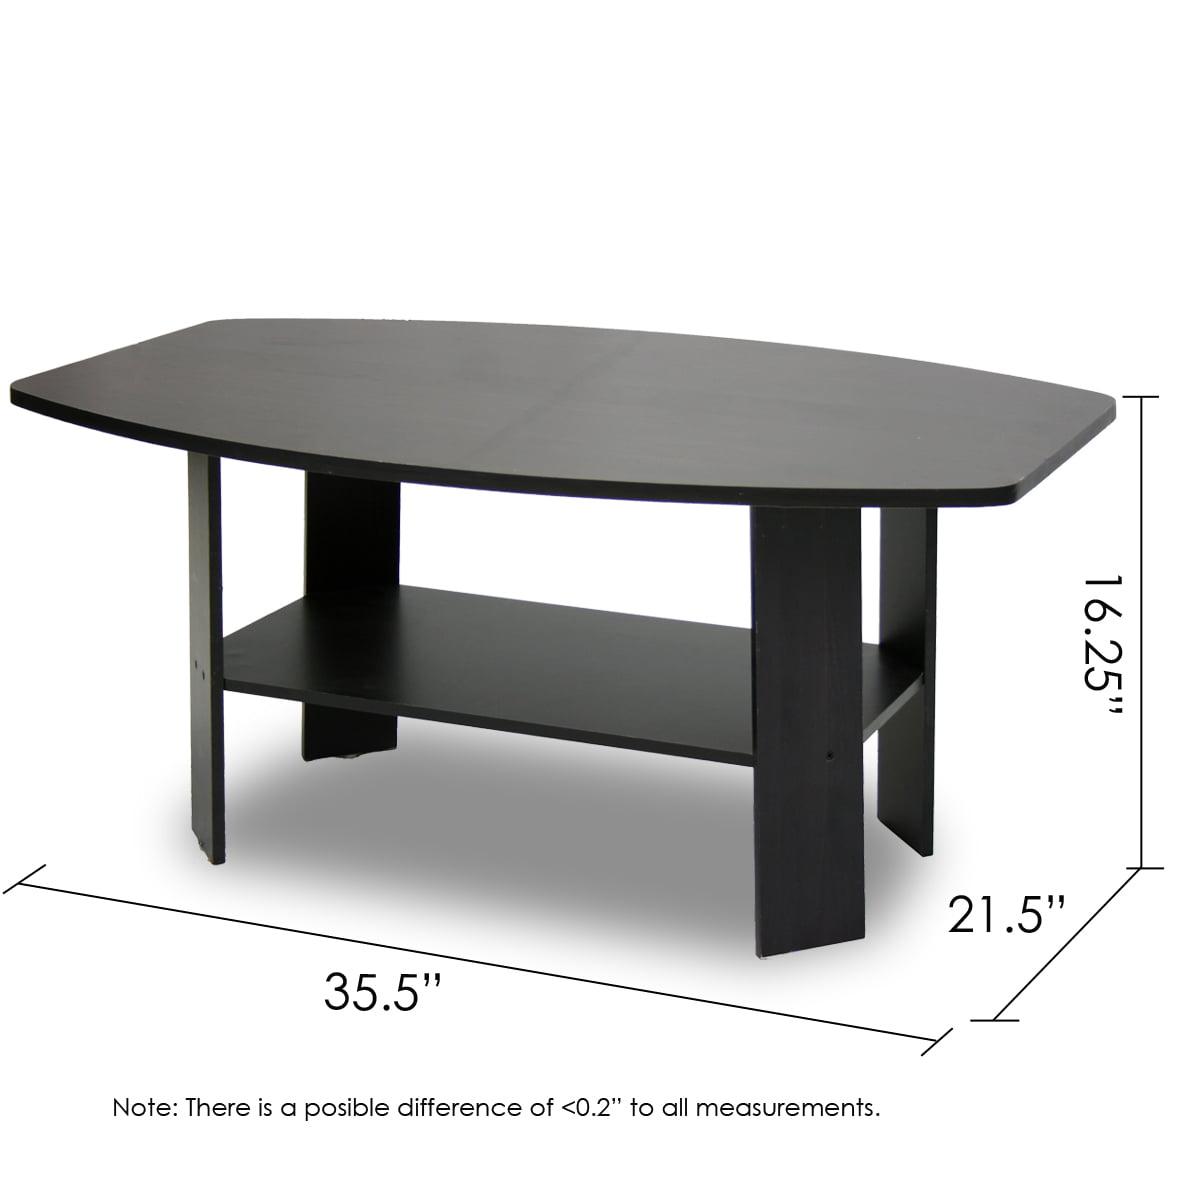 - Furinno Simple Design Coffee Table - Walmart.com - Walmart.com